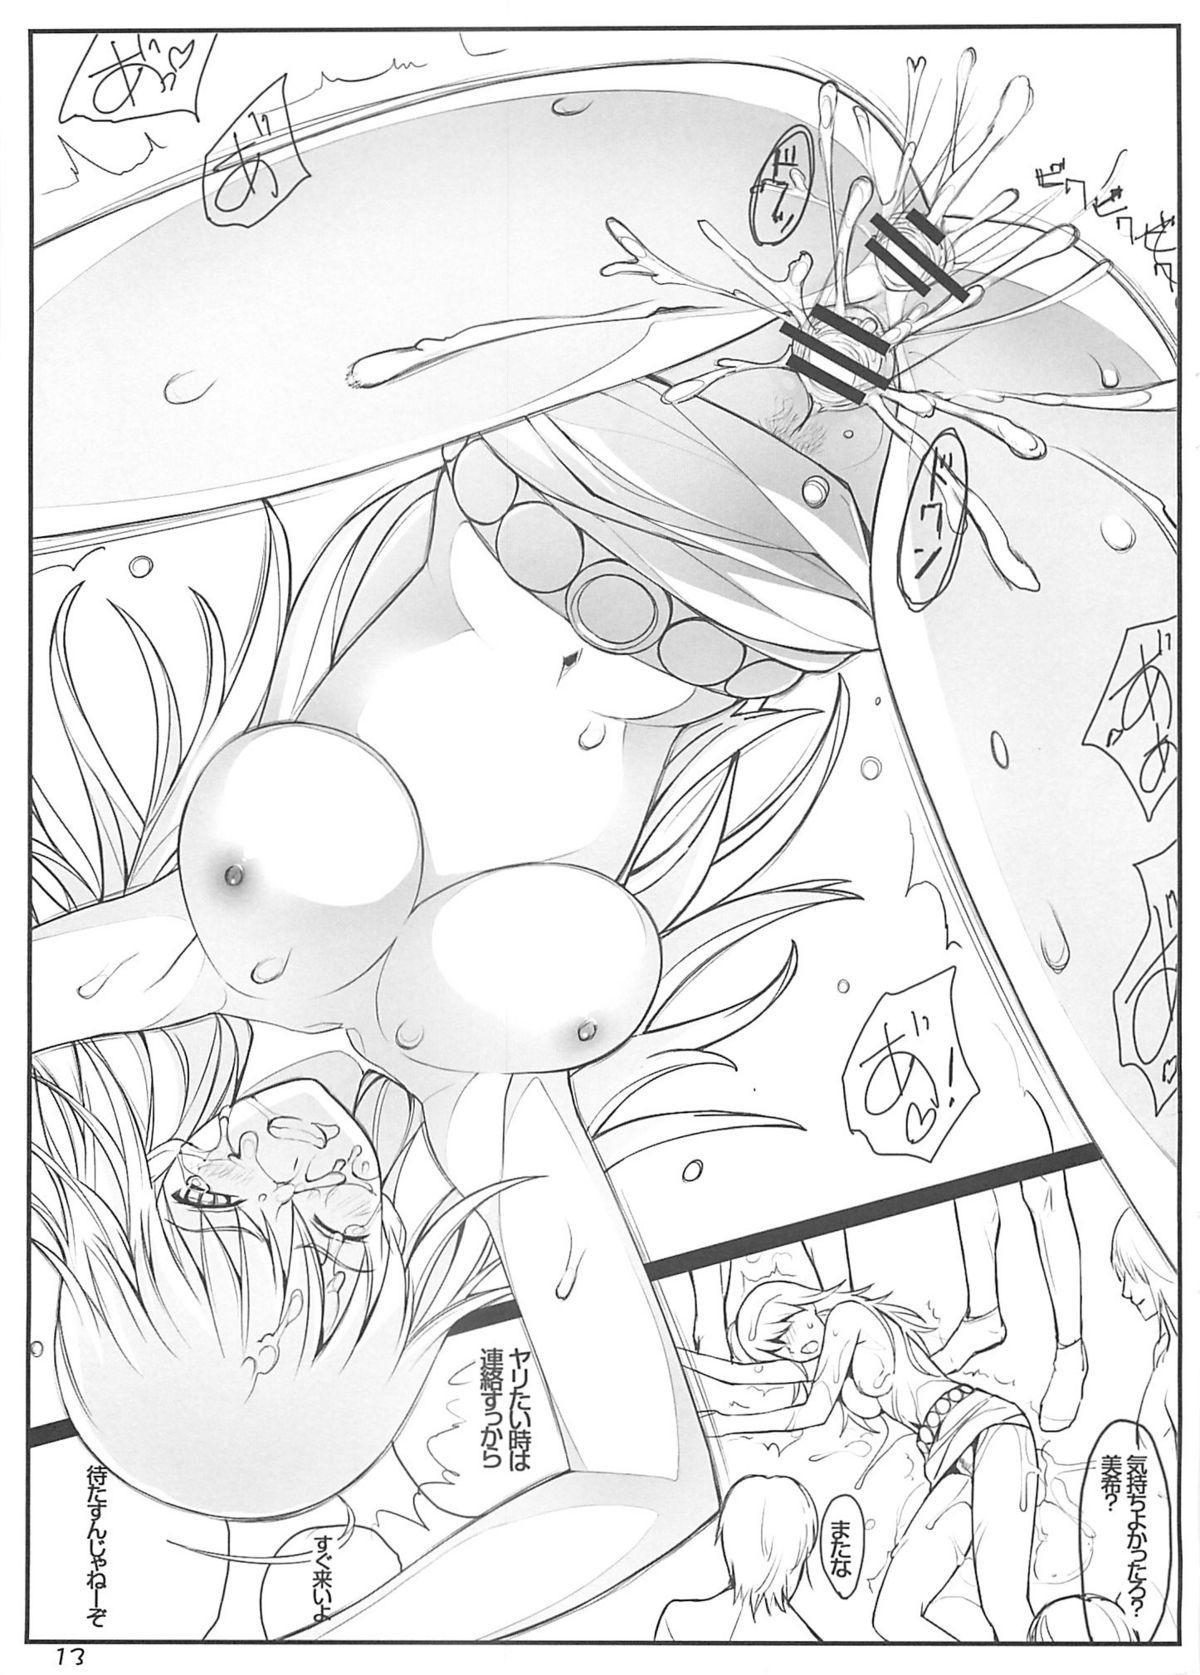 Enikki Recycle 8 no Omake Hon - Dossamagi! 12